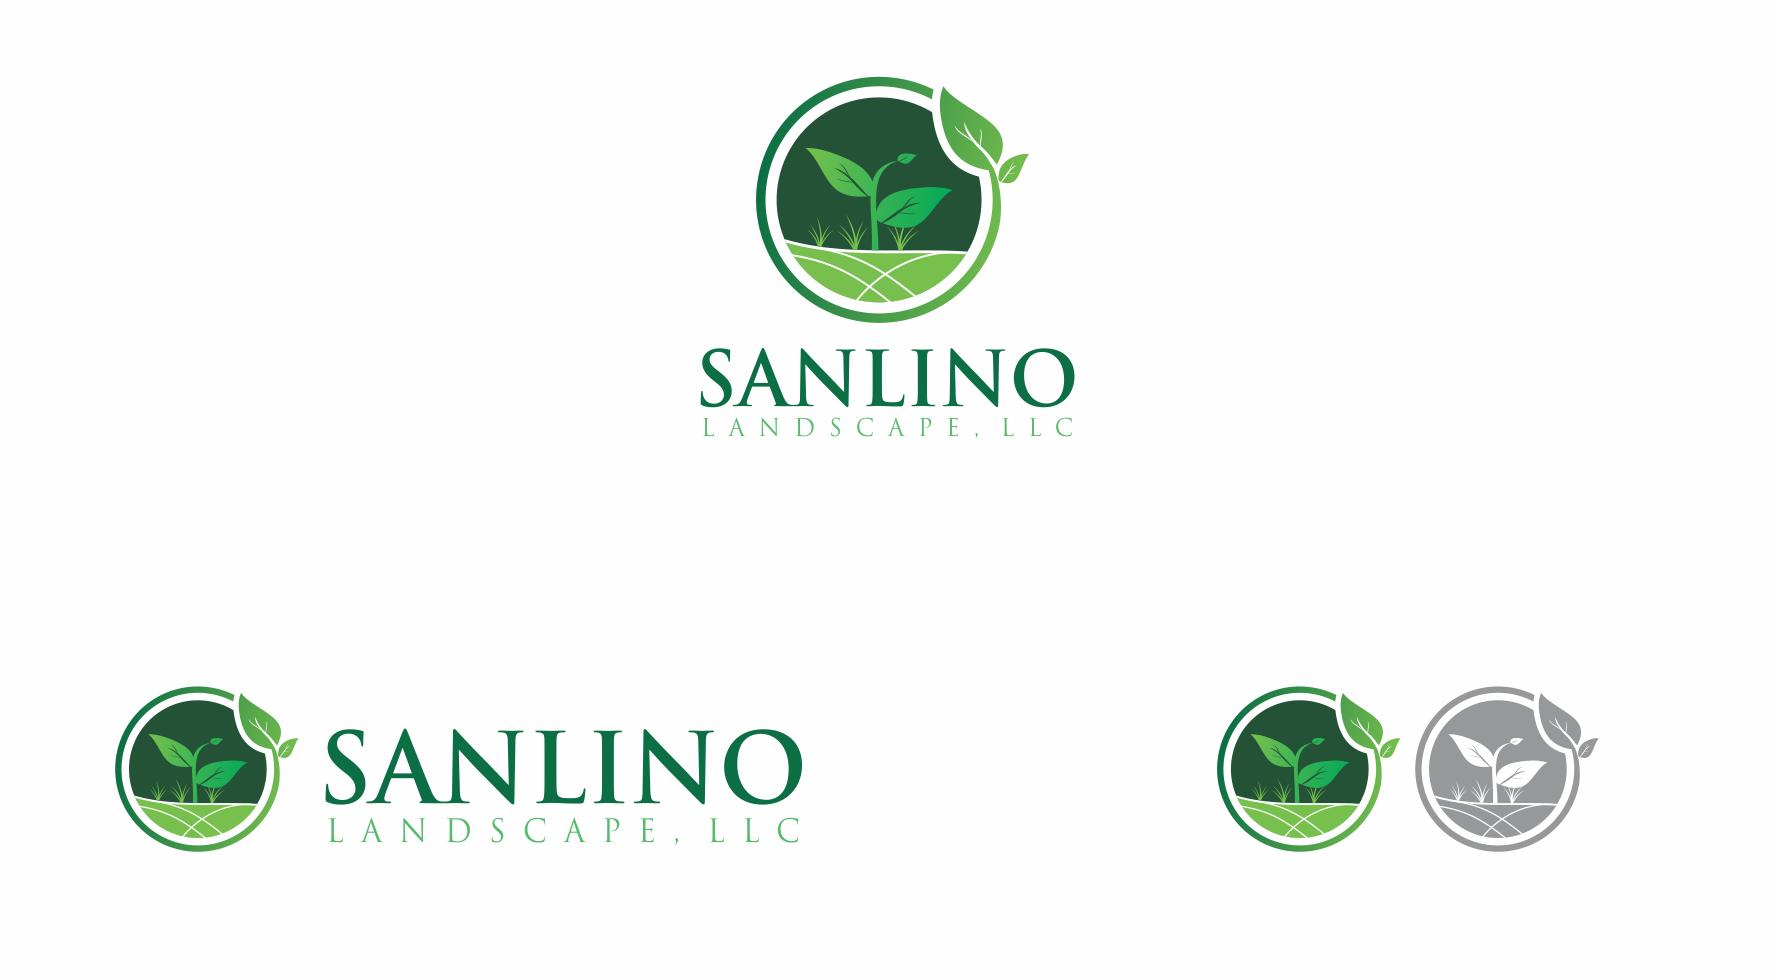 Logo Design by Private User - Entry No. 51 in the Logo Design Contest New Logo Design for Sanlino Landscape, LLC.